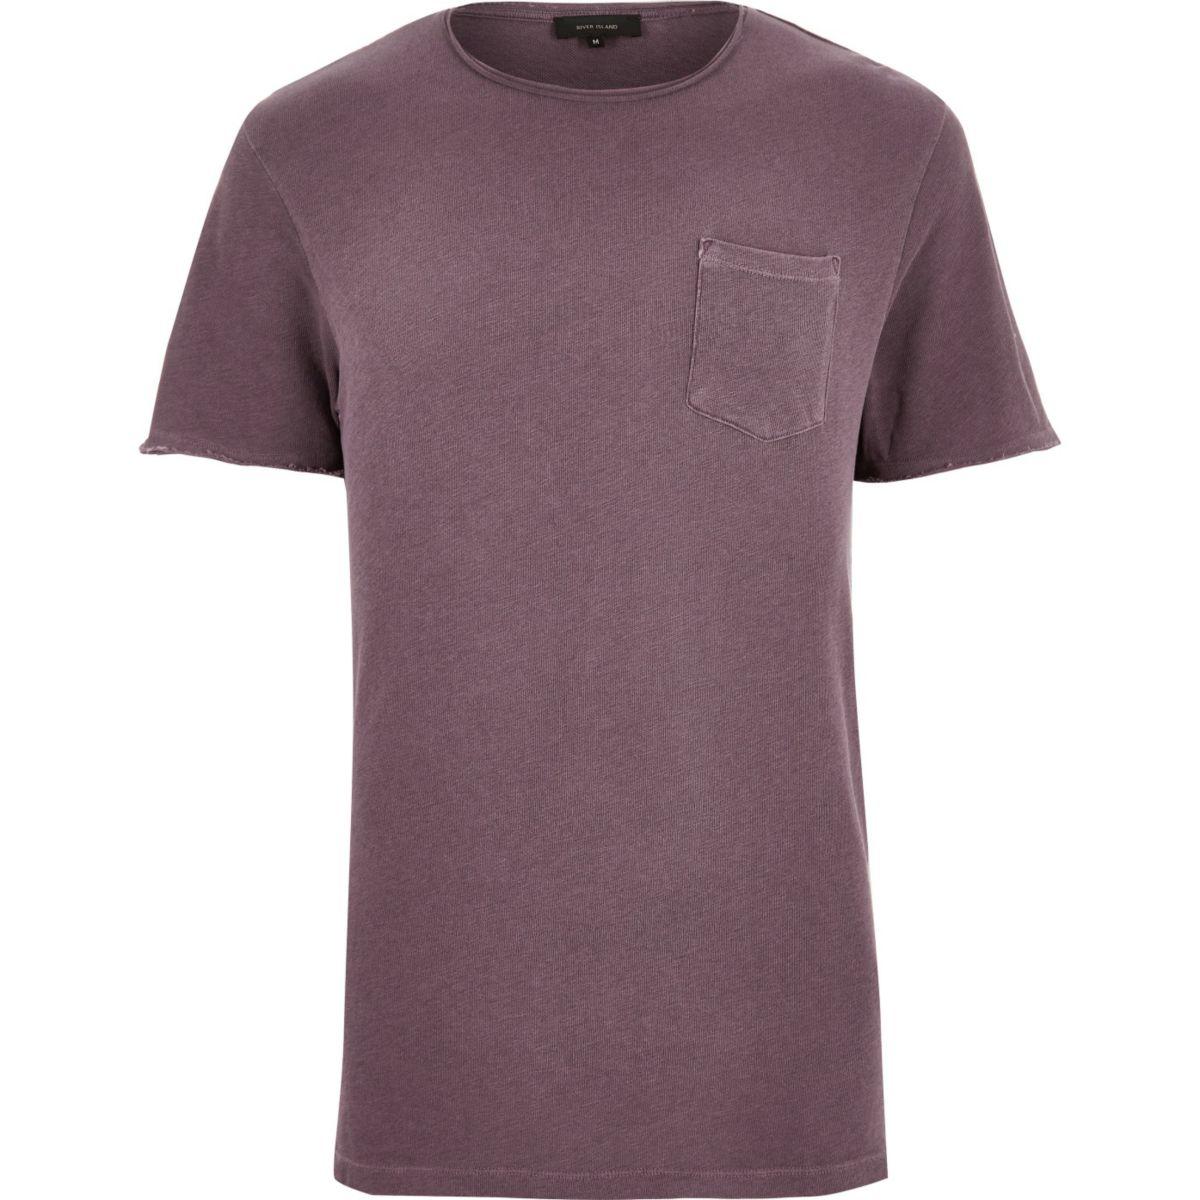 Red raw hem t-shirt